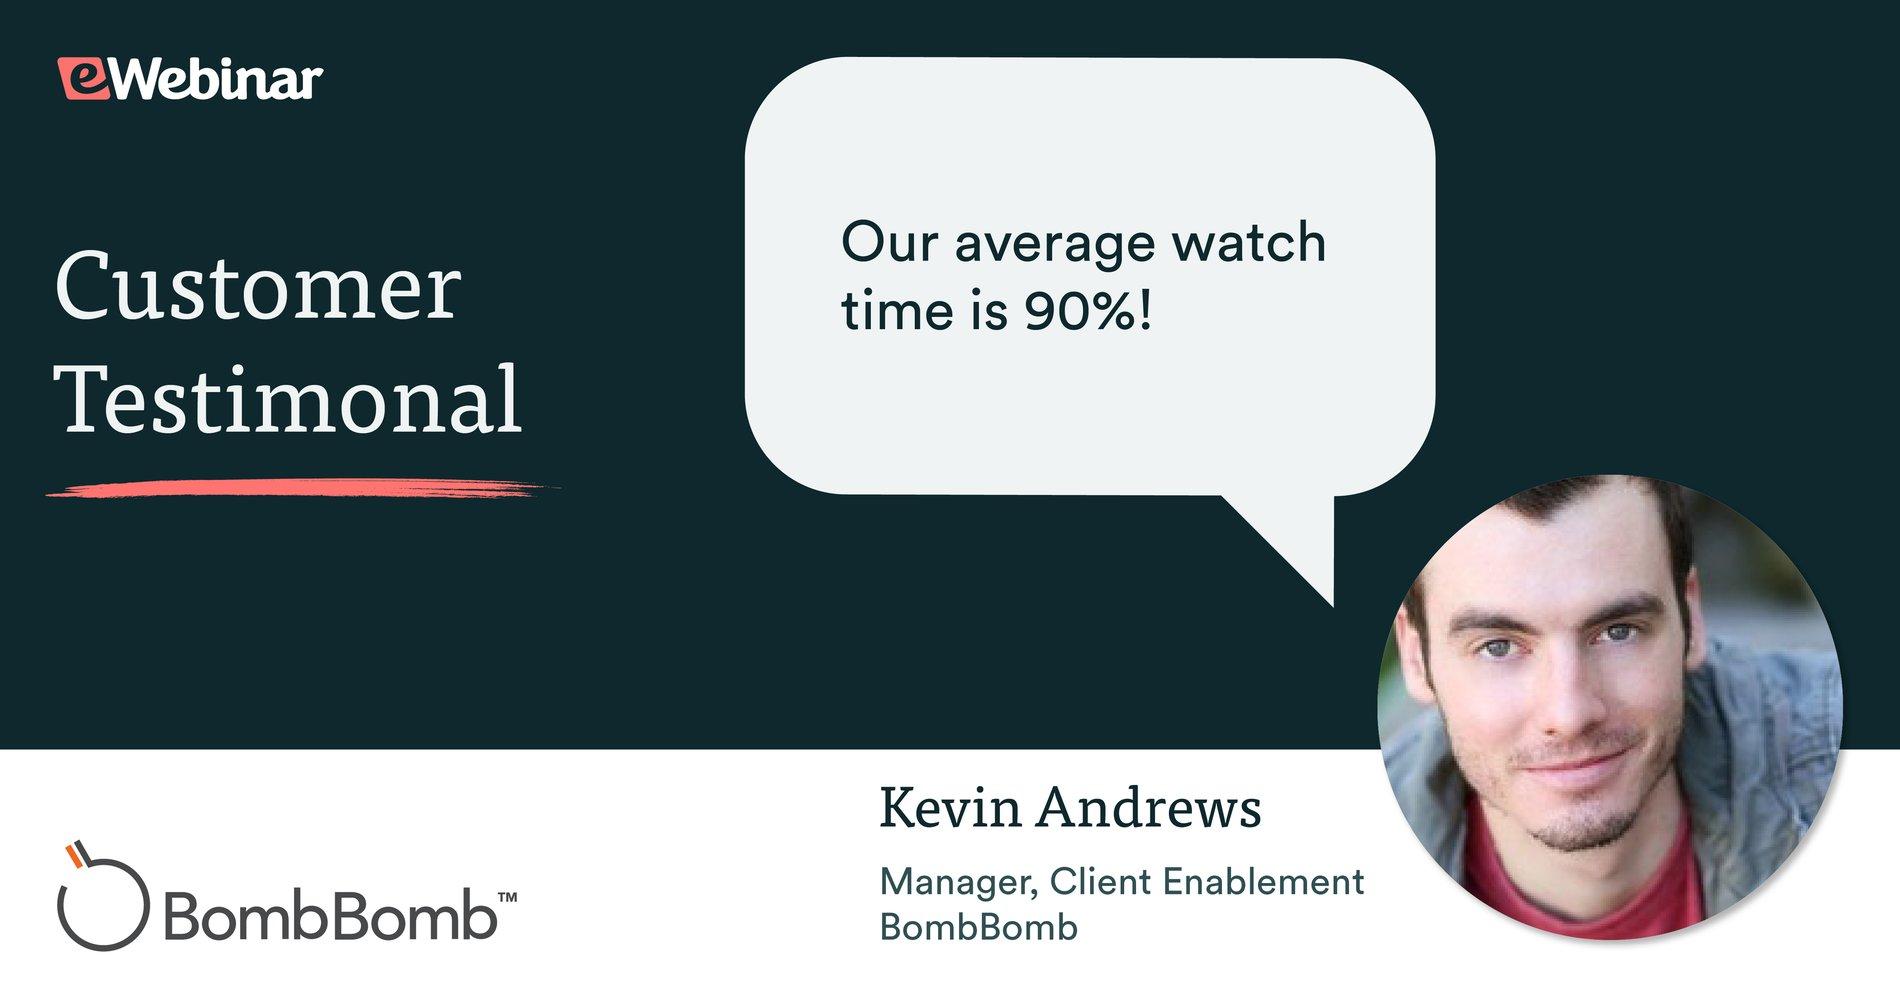 Increasing webinar watch time from 70% to 90% with eWebinar